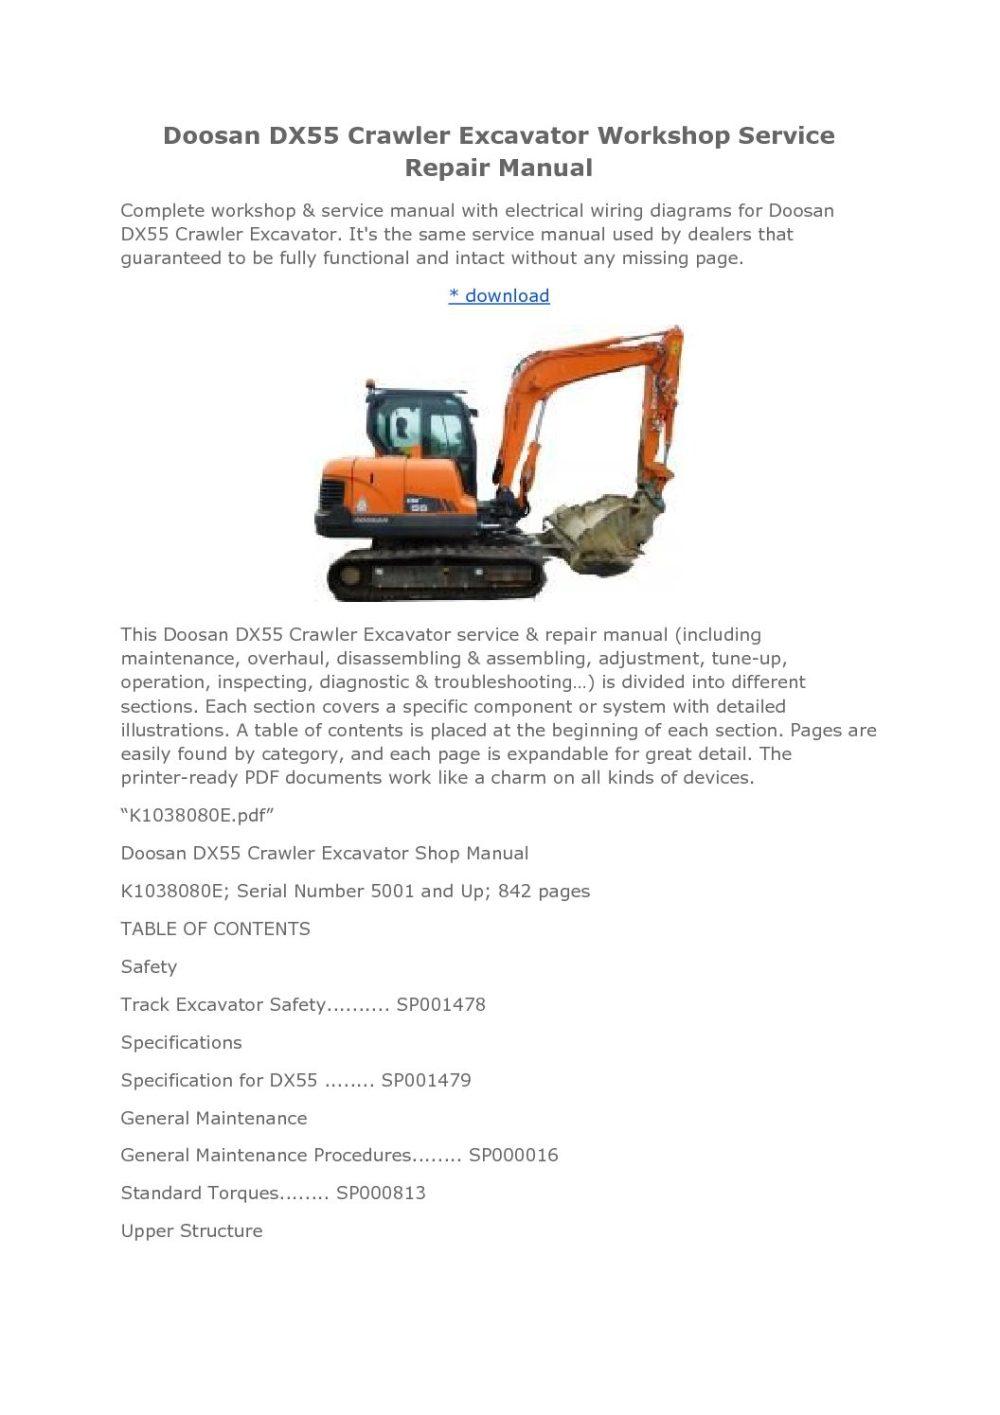 medium resolution of doosan dx55 crawler excavator workshop service repair manual jpg